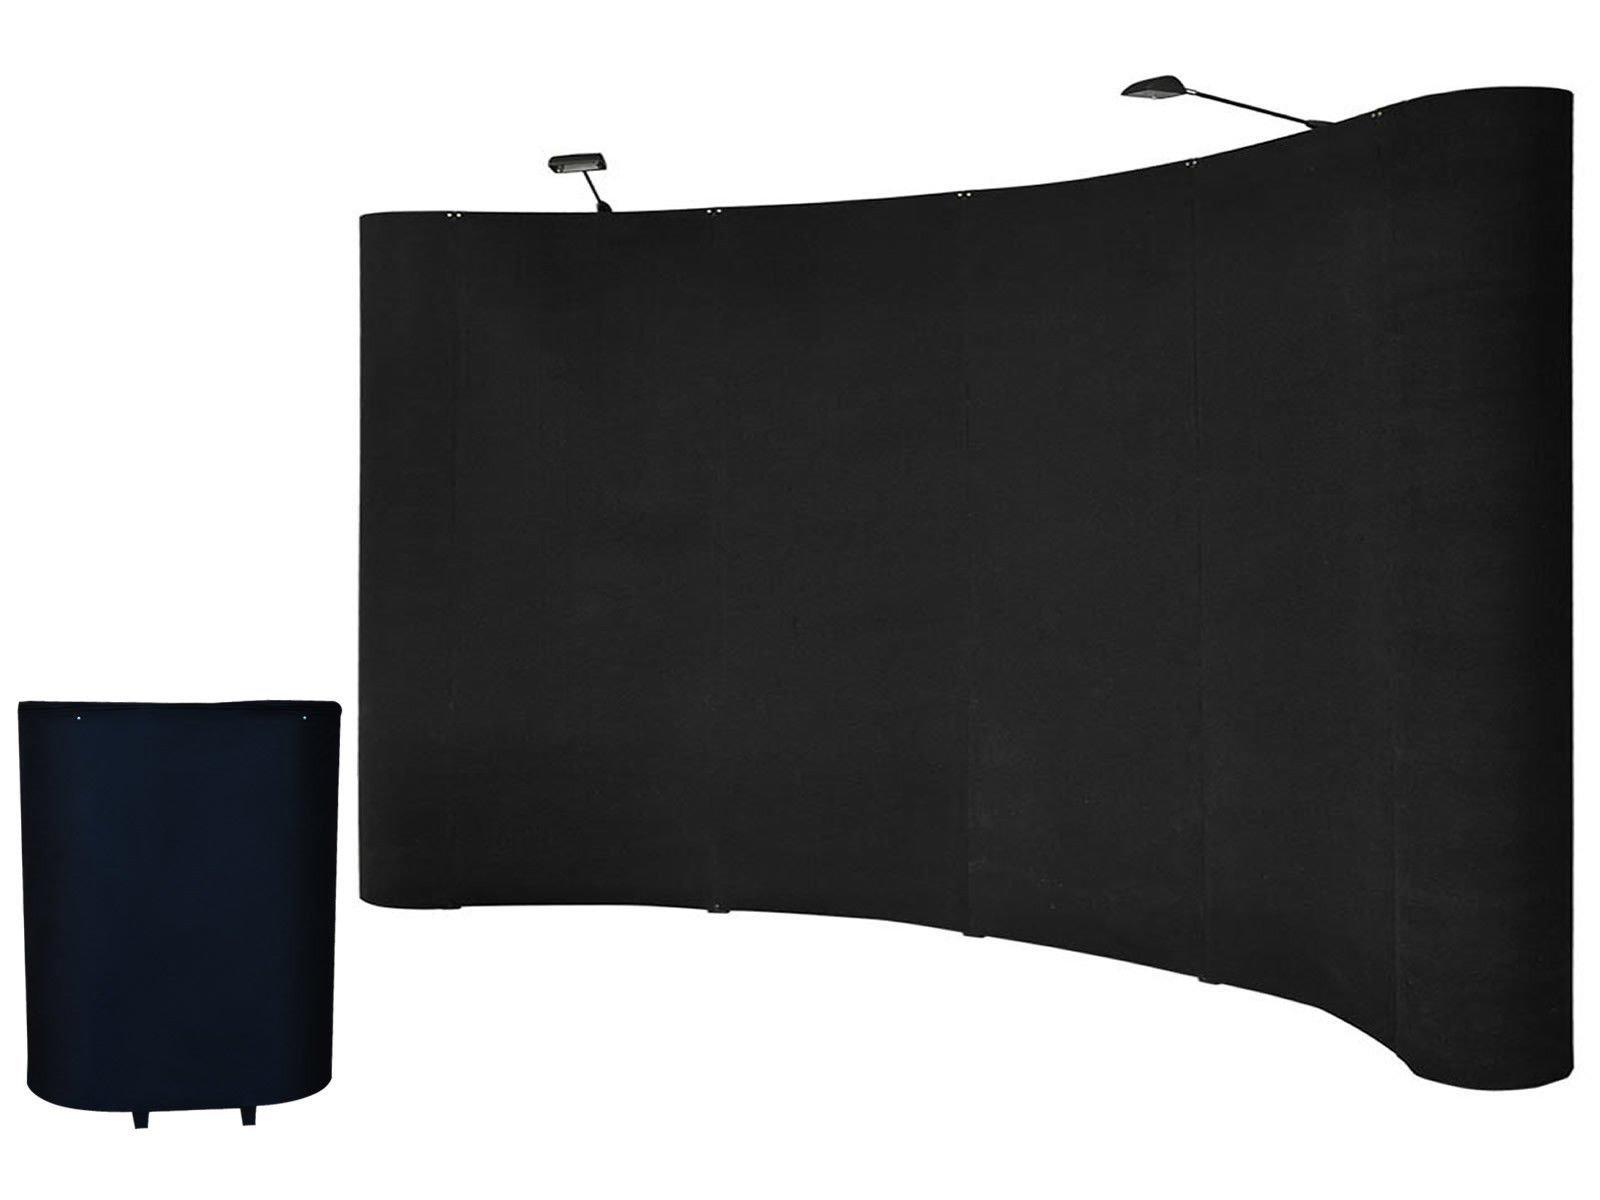 Goplus 10'ft Portable Black Display Trade Show Booth Exhibit Pop up Kit W/spotlights